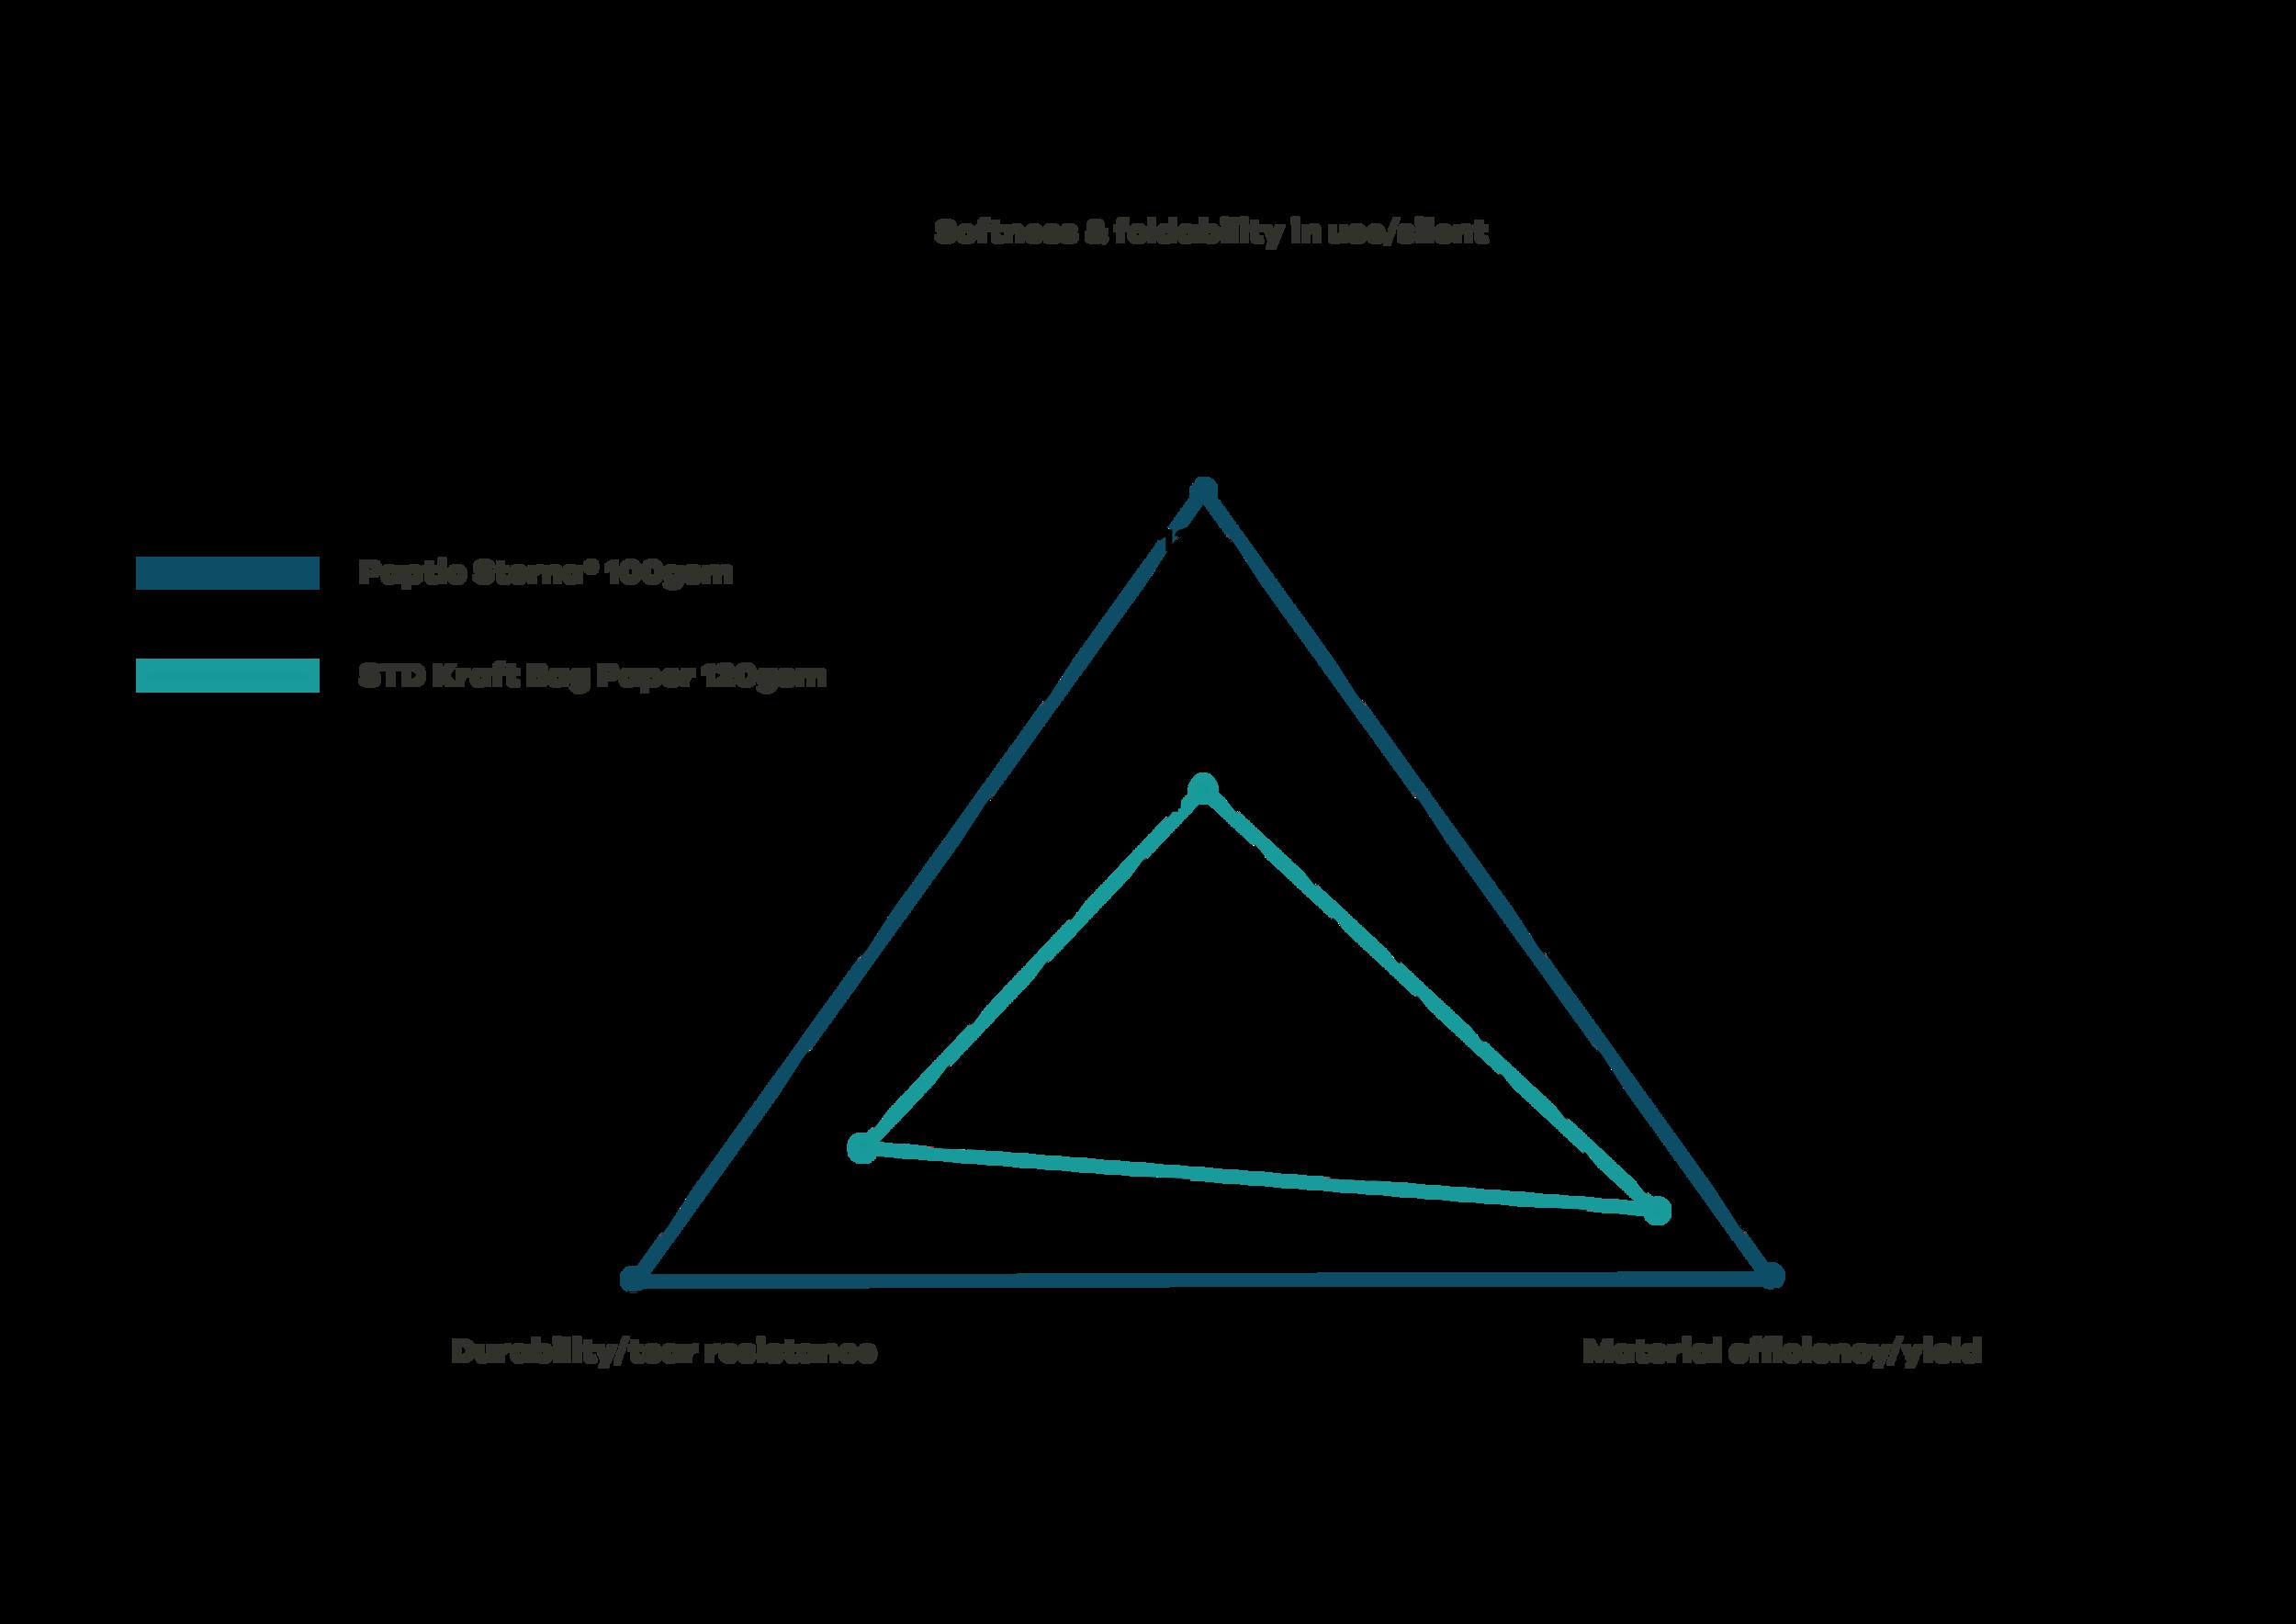 sternavskraft_triangle - 01. - png